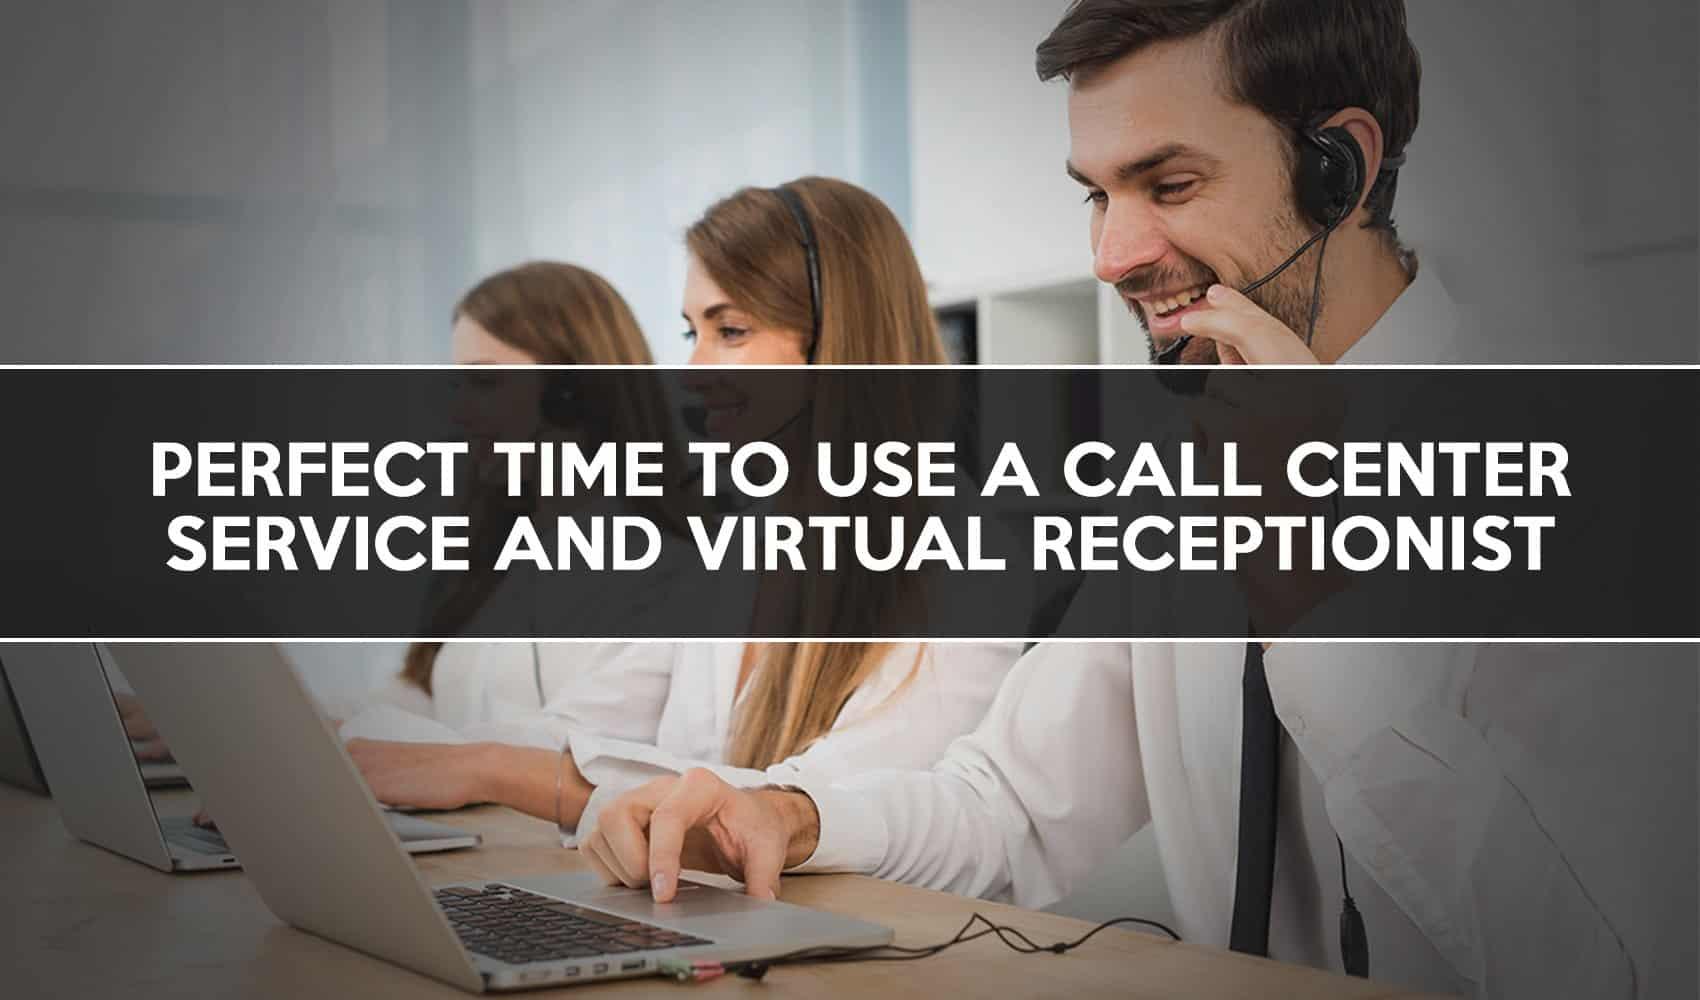 Three call center employees enjoying their job taking calls